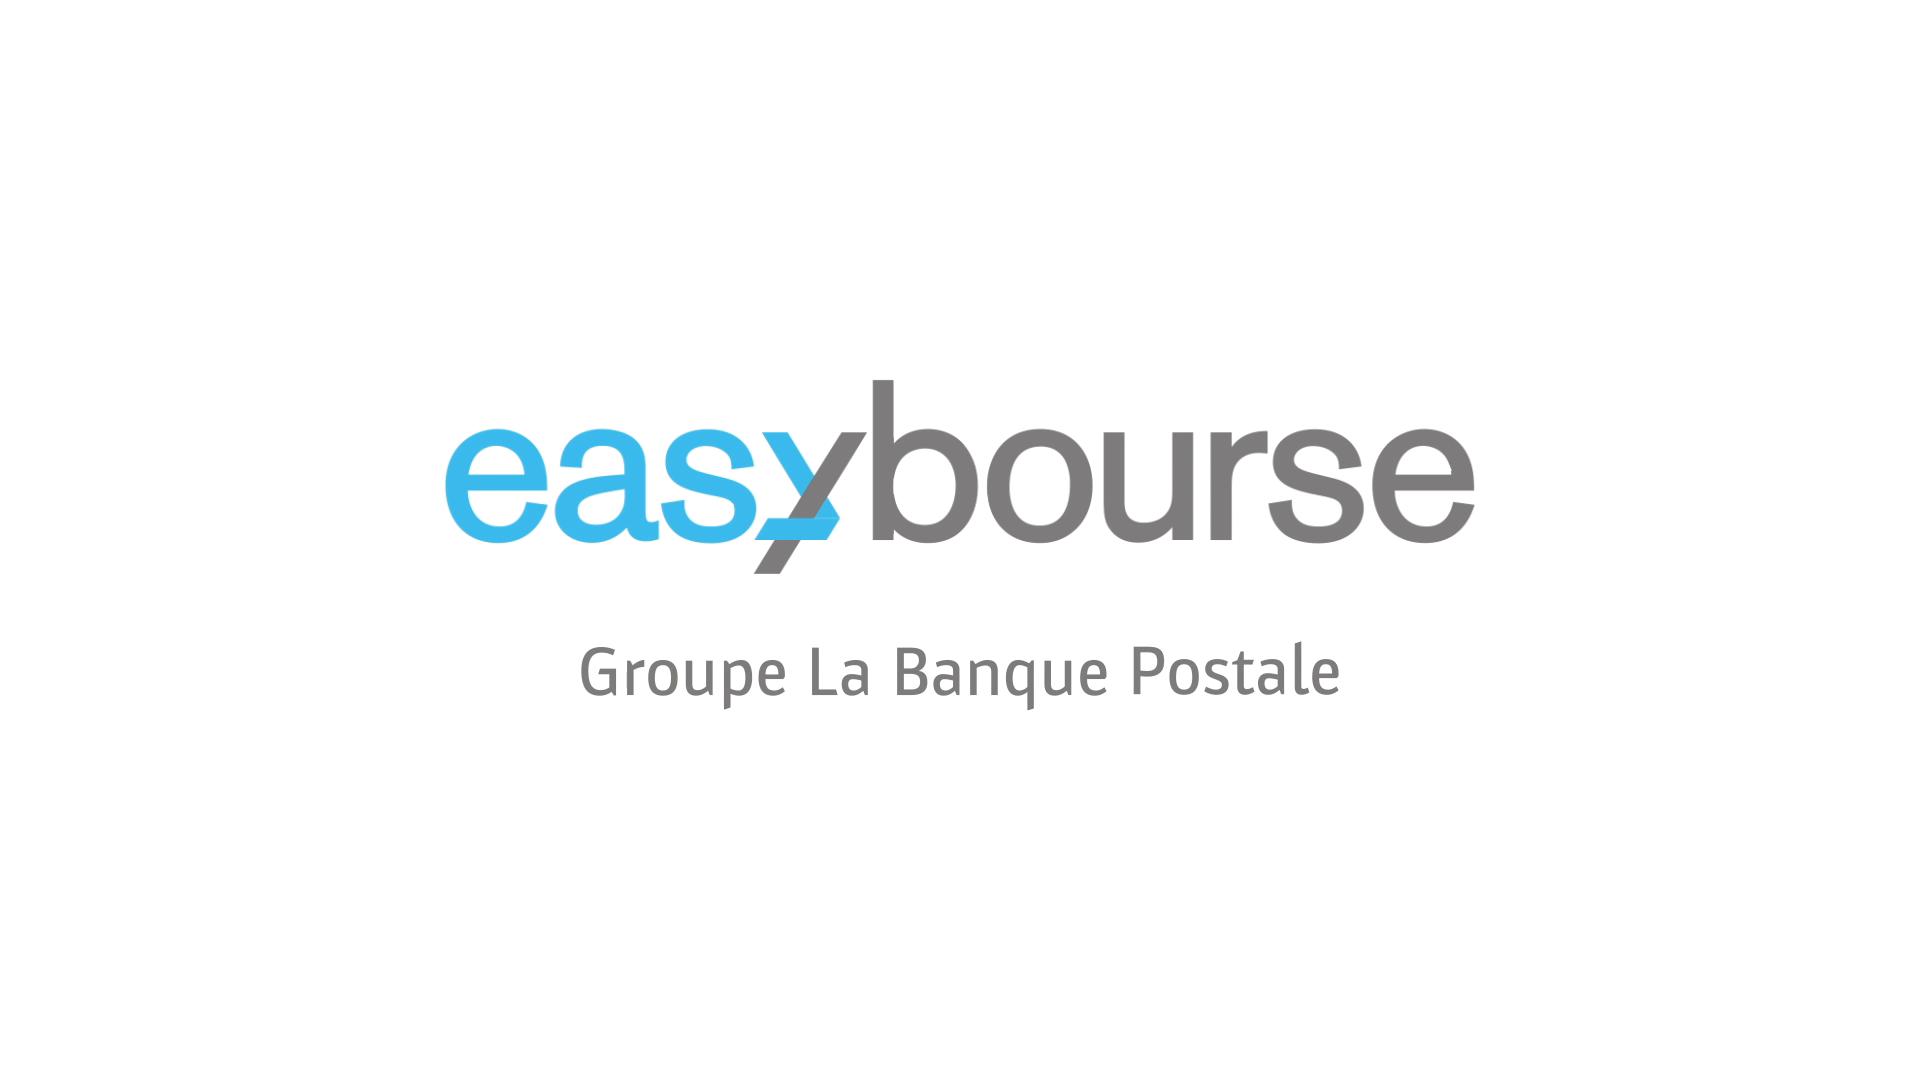 Un avis objectif concernant Easy bourse